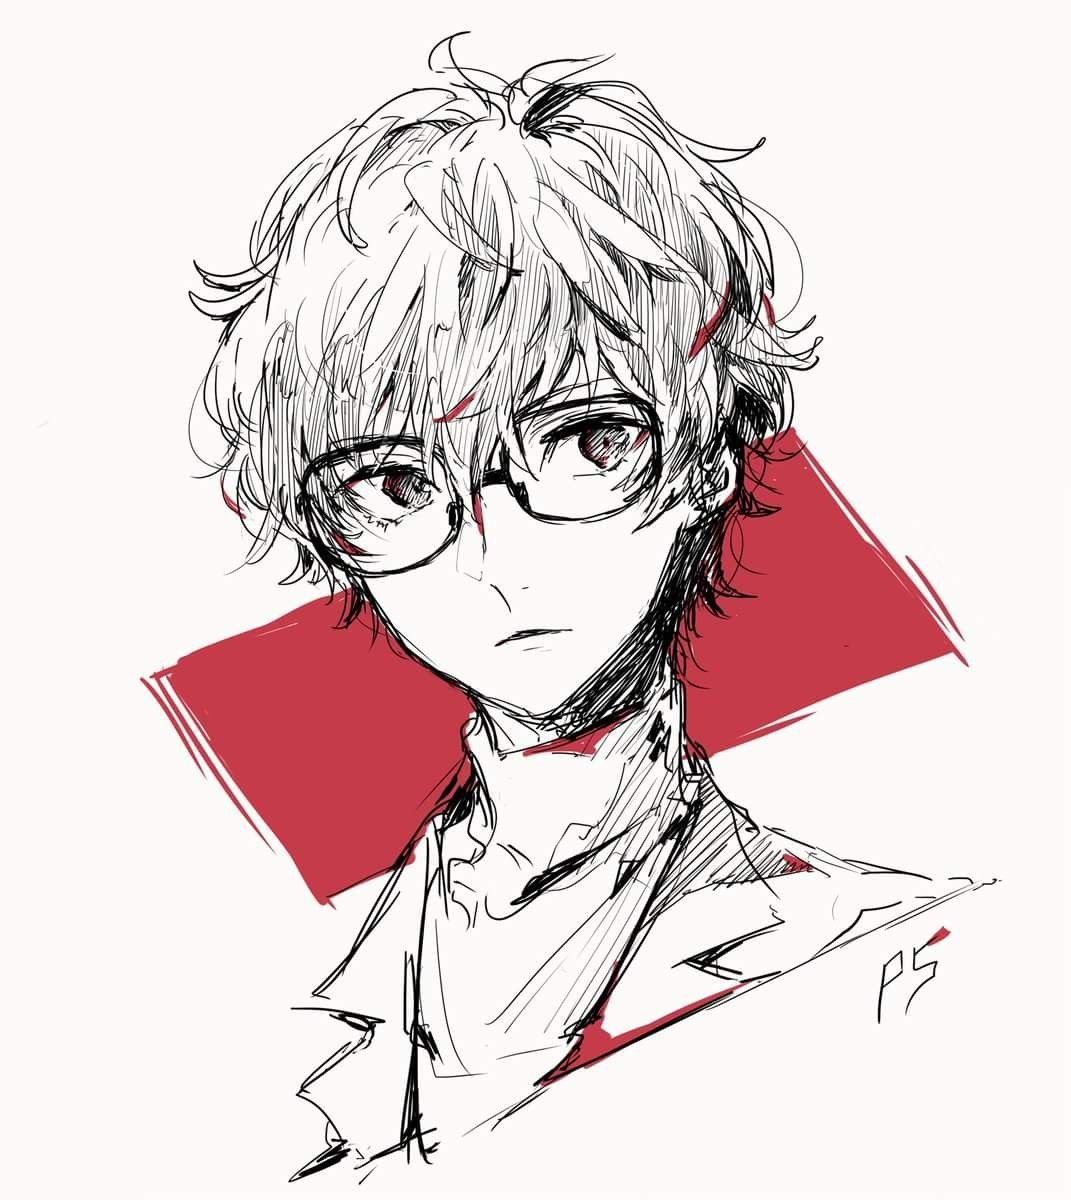 Pin By La Enmascarada Abrilita On Rersoha Persona 5 Anime Persona 5 Joker Persona 5